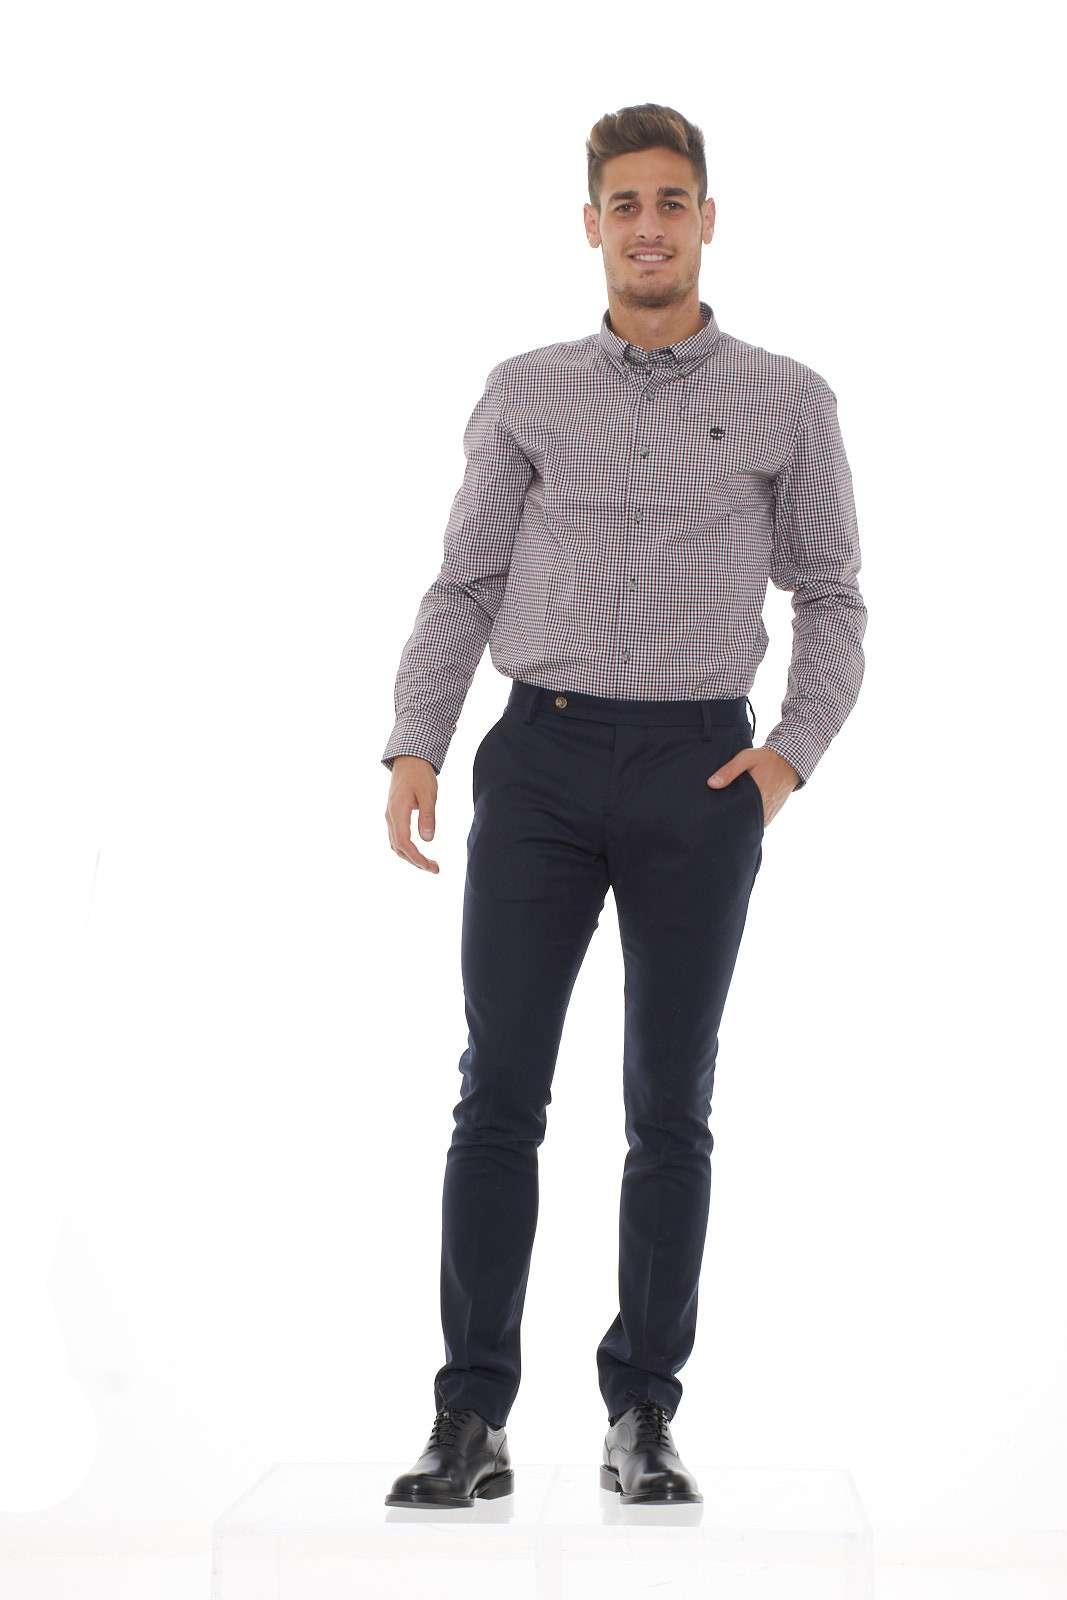 https://www.parmax.com/media/catalog/product/a/i/ai-outlet_parmax-pantaloni-uomo-entre-amis-a198346520-d.jpg